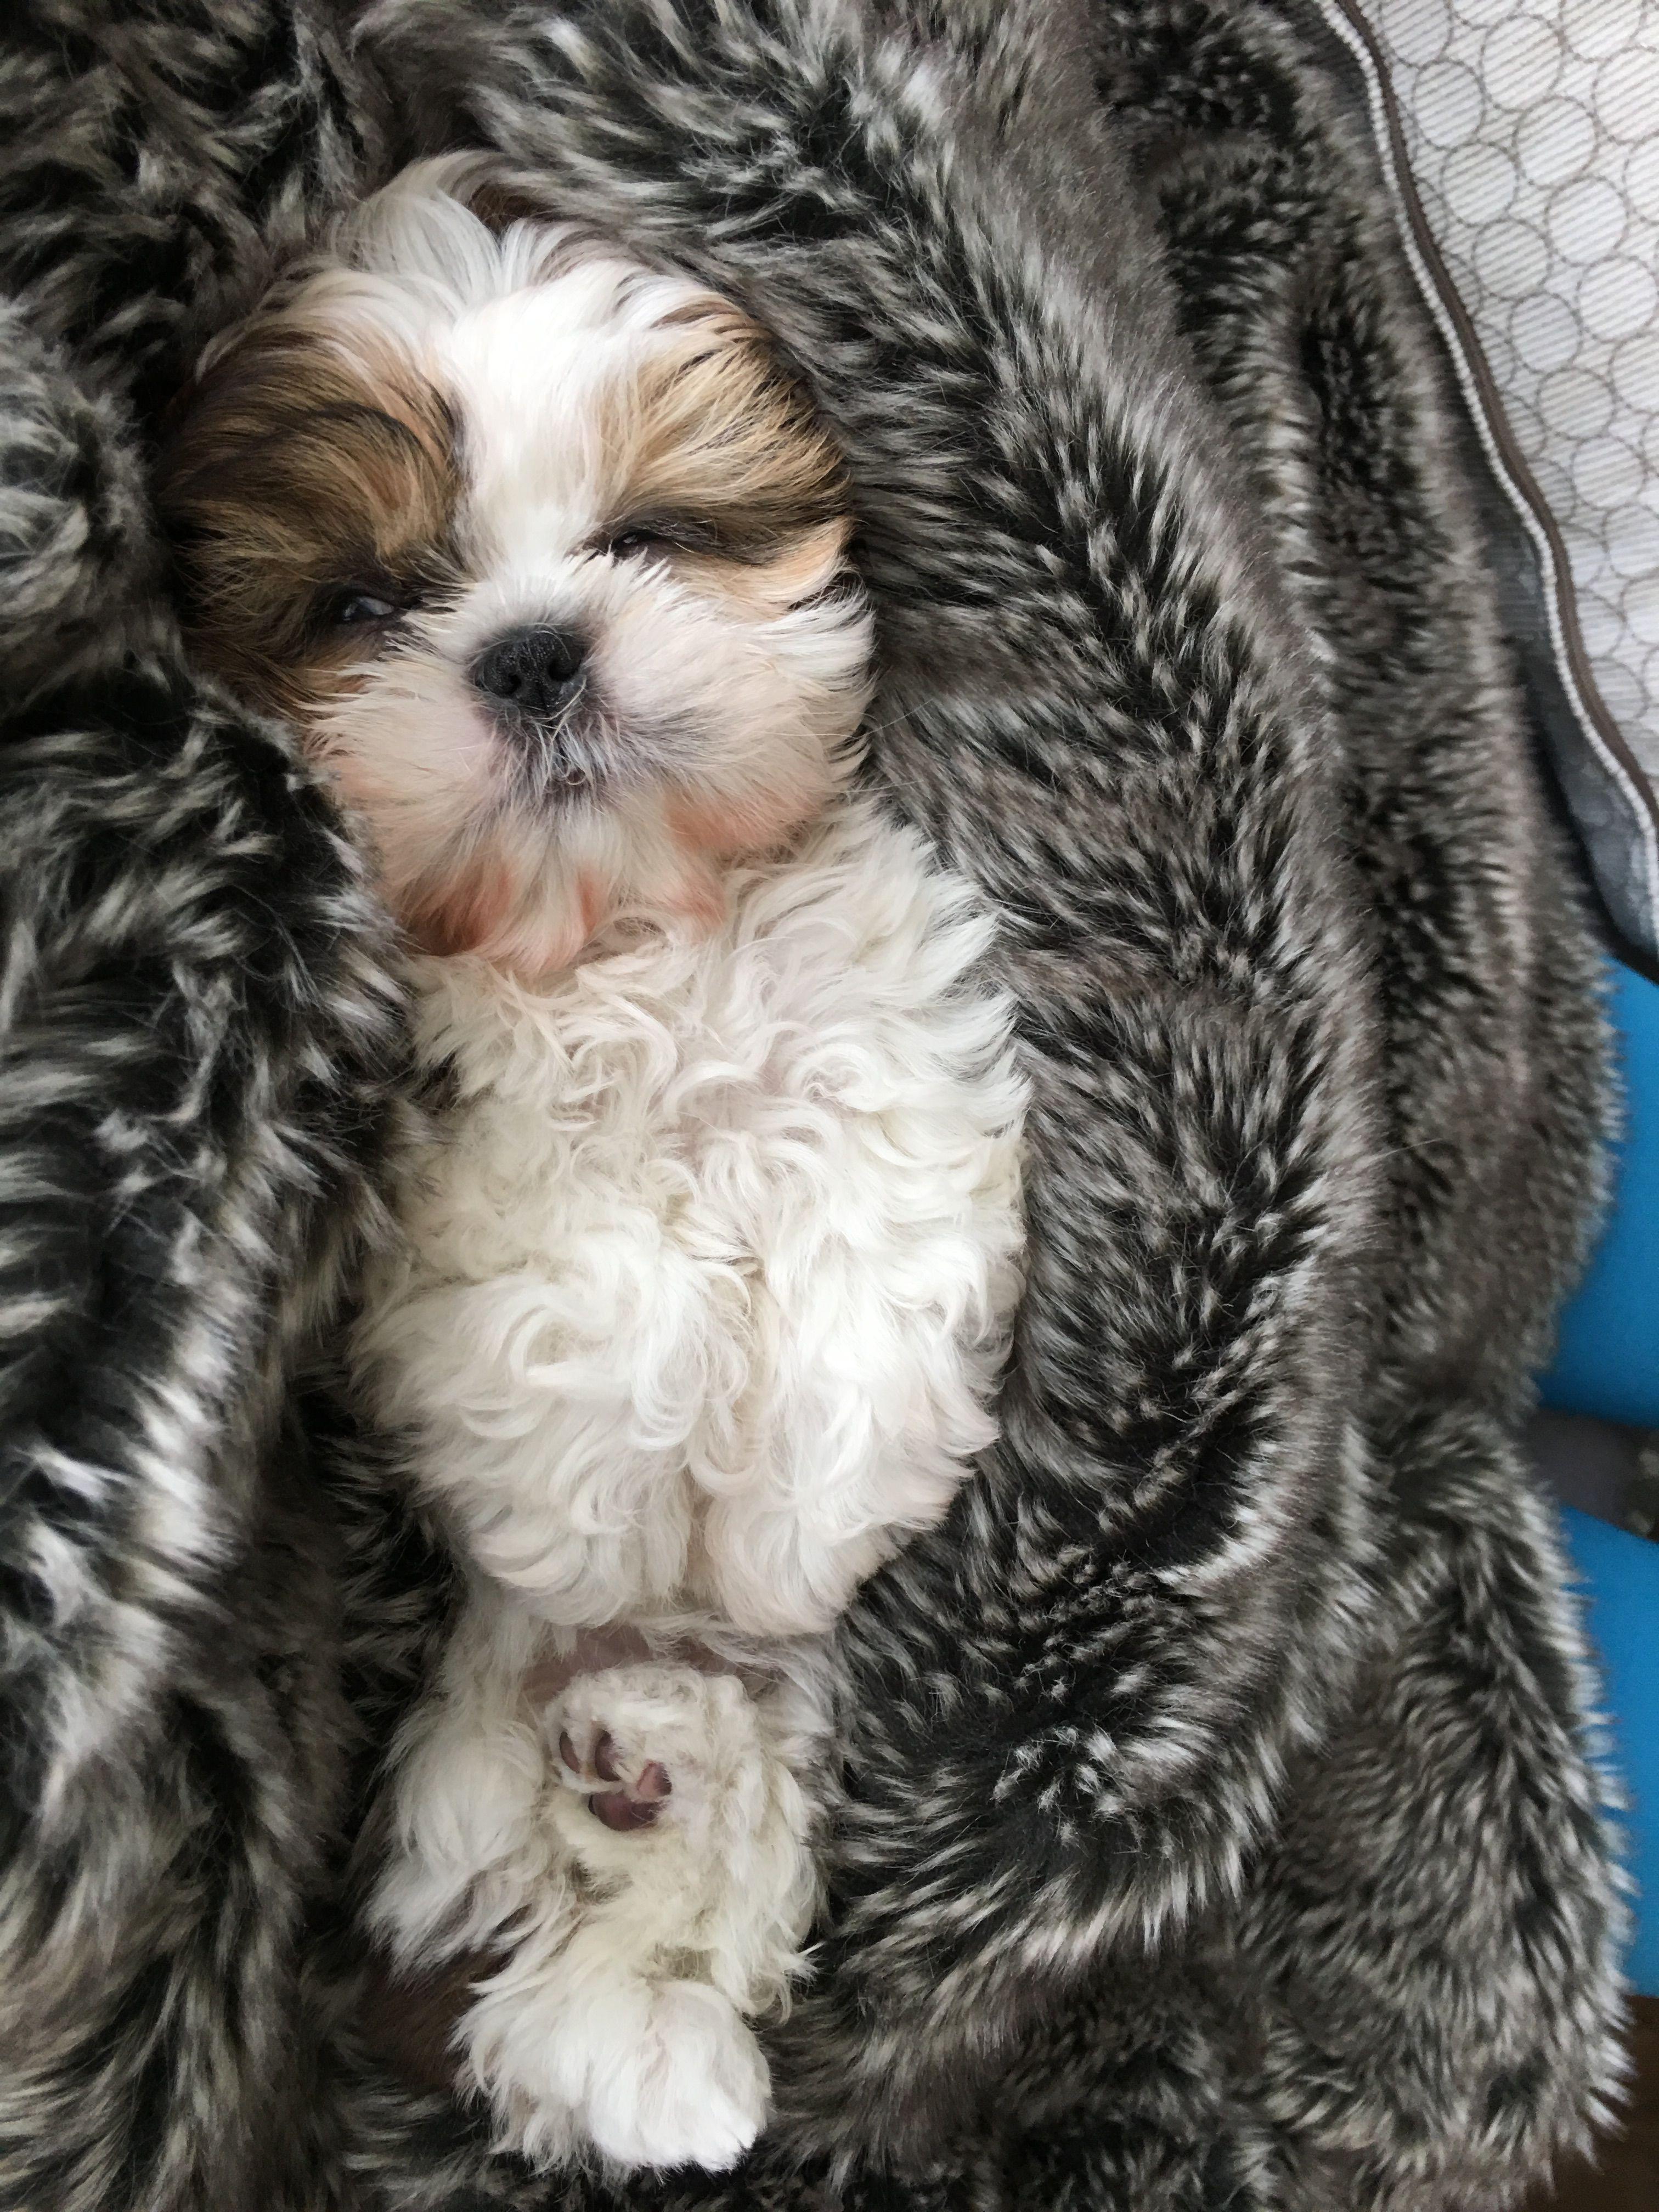 Pin By Brenda Cardwell On Mandy Shih Tzu Shih Tzu Puppy Dogs